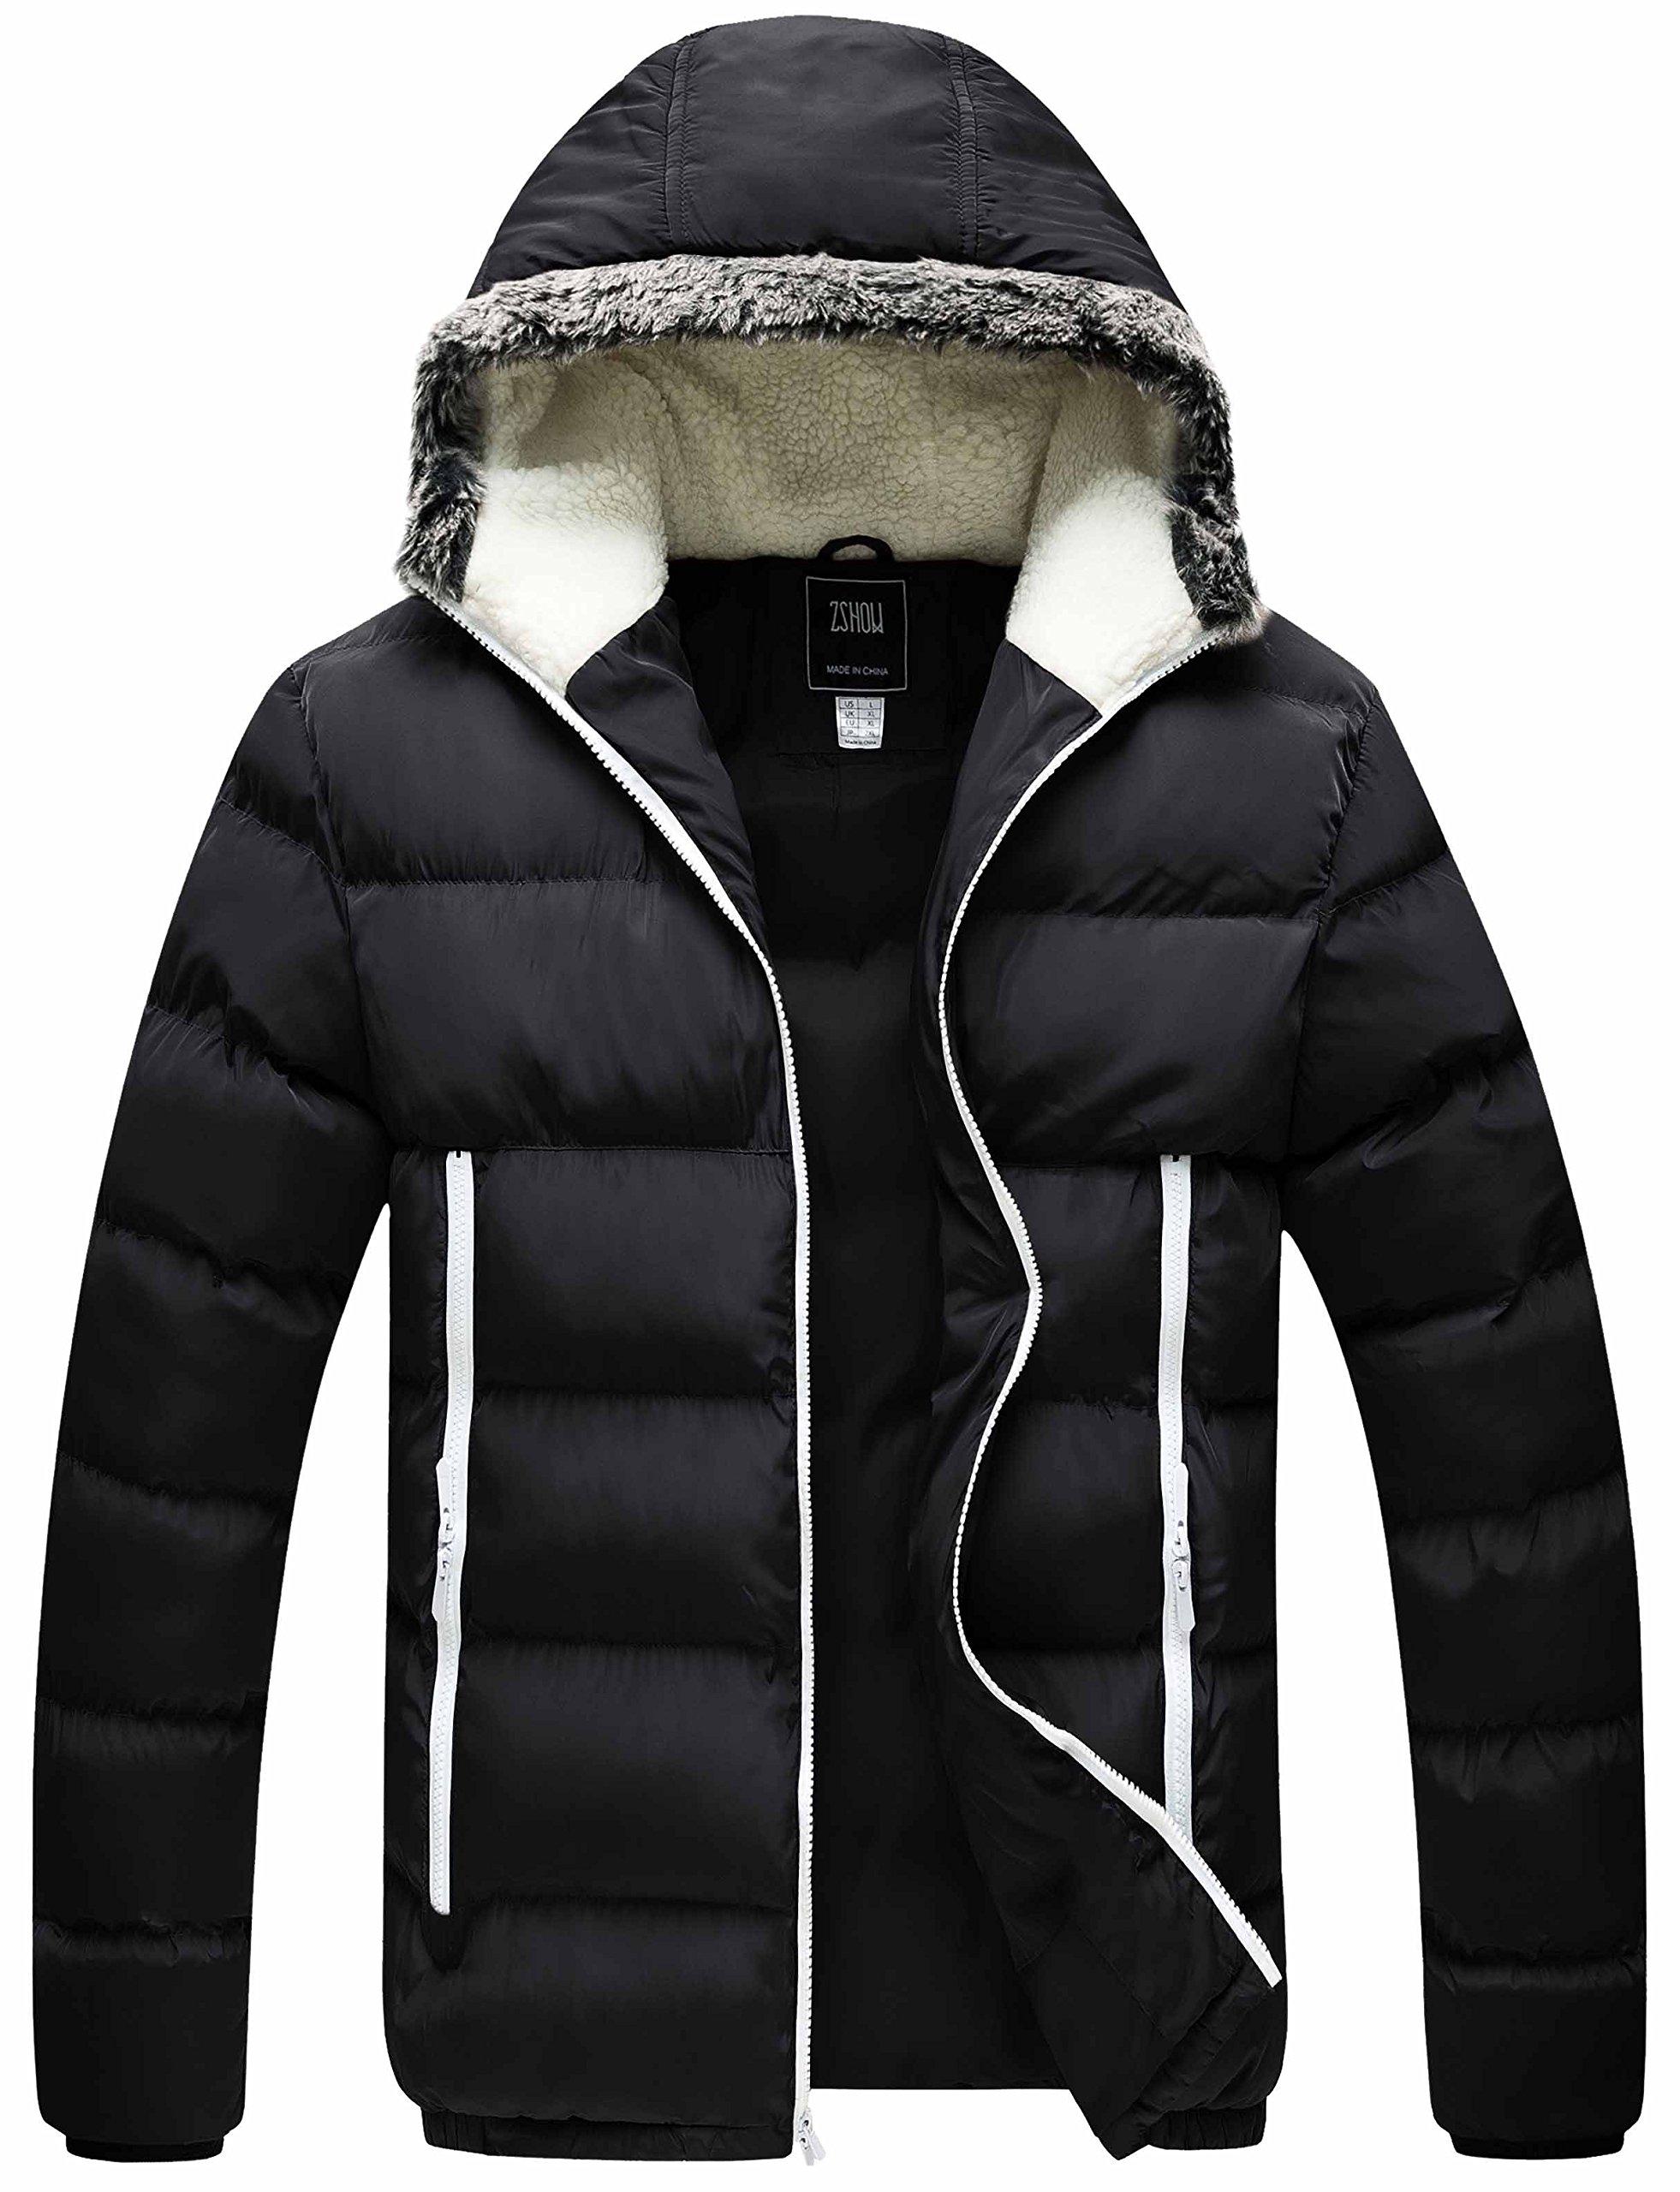 ZSHOW Men's Winter Outwear Hooded Cotton Jacket(Black,X-Large)